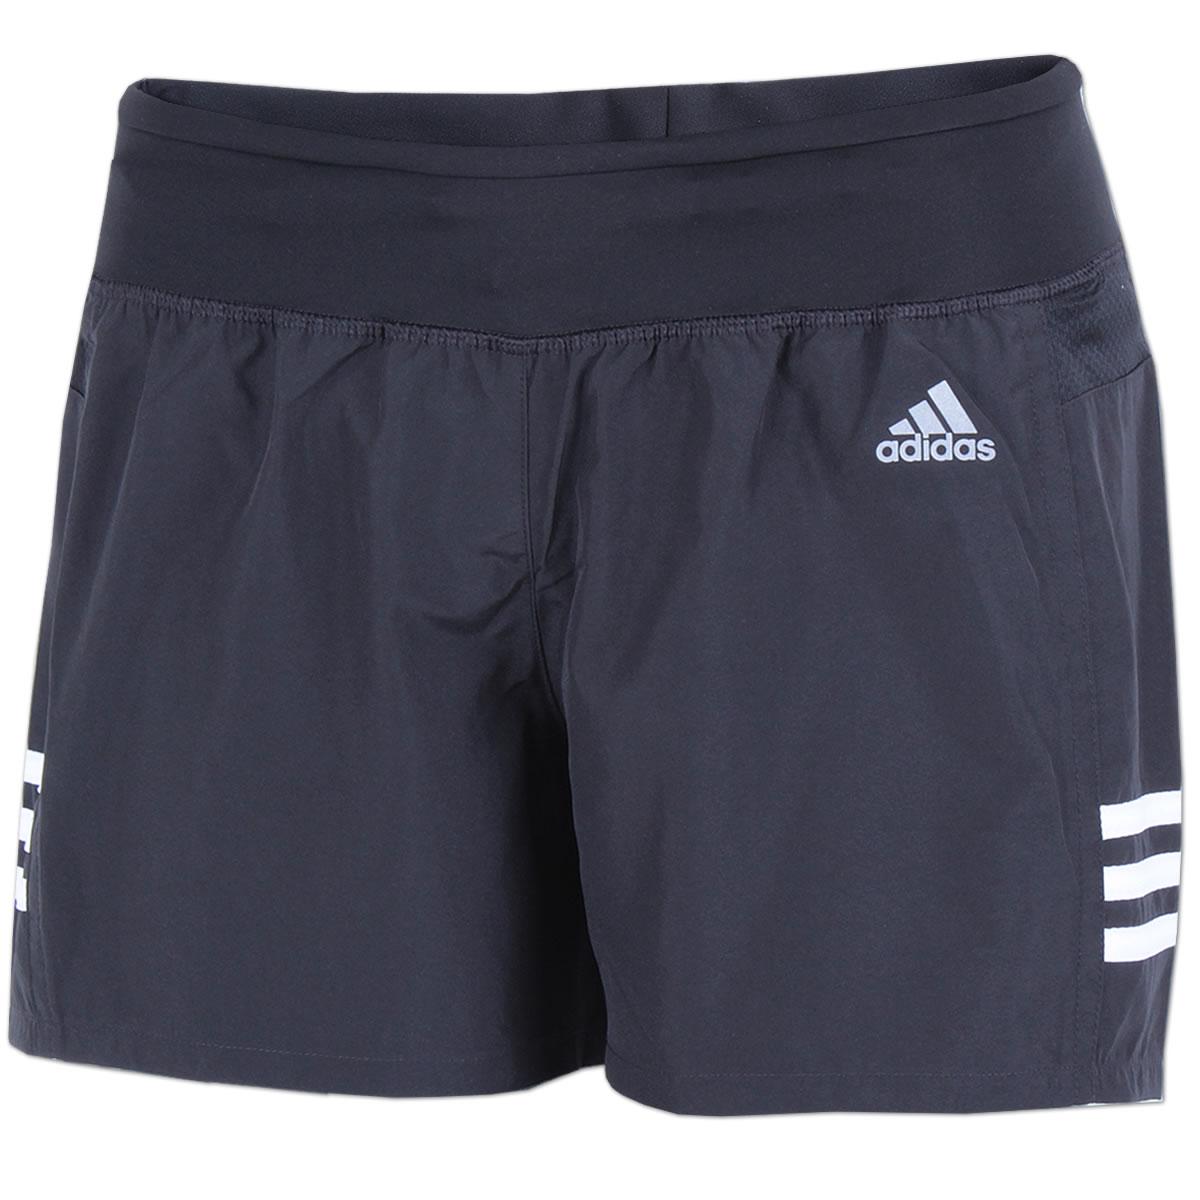 adidas Damen Originals Trefoil Slim Short Laufshort Running